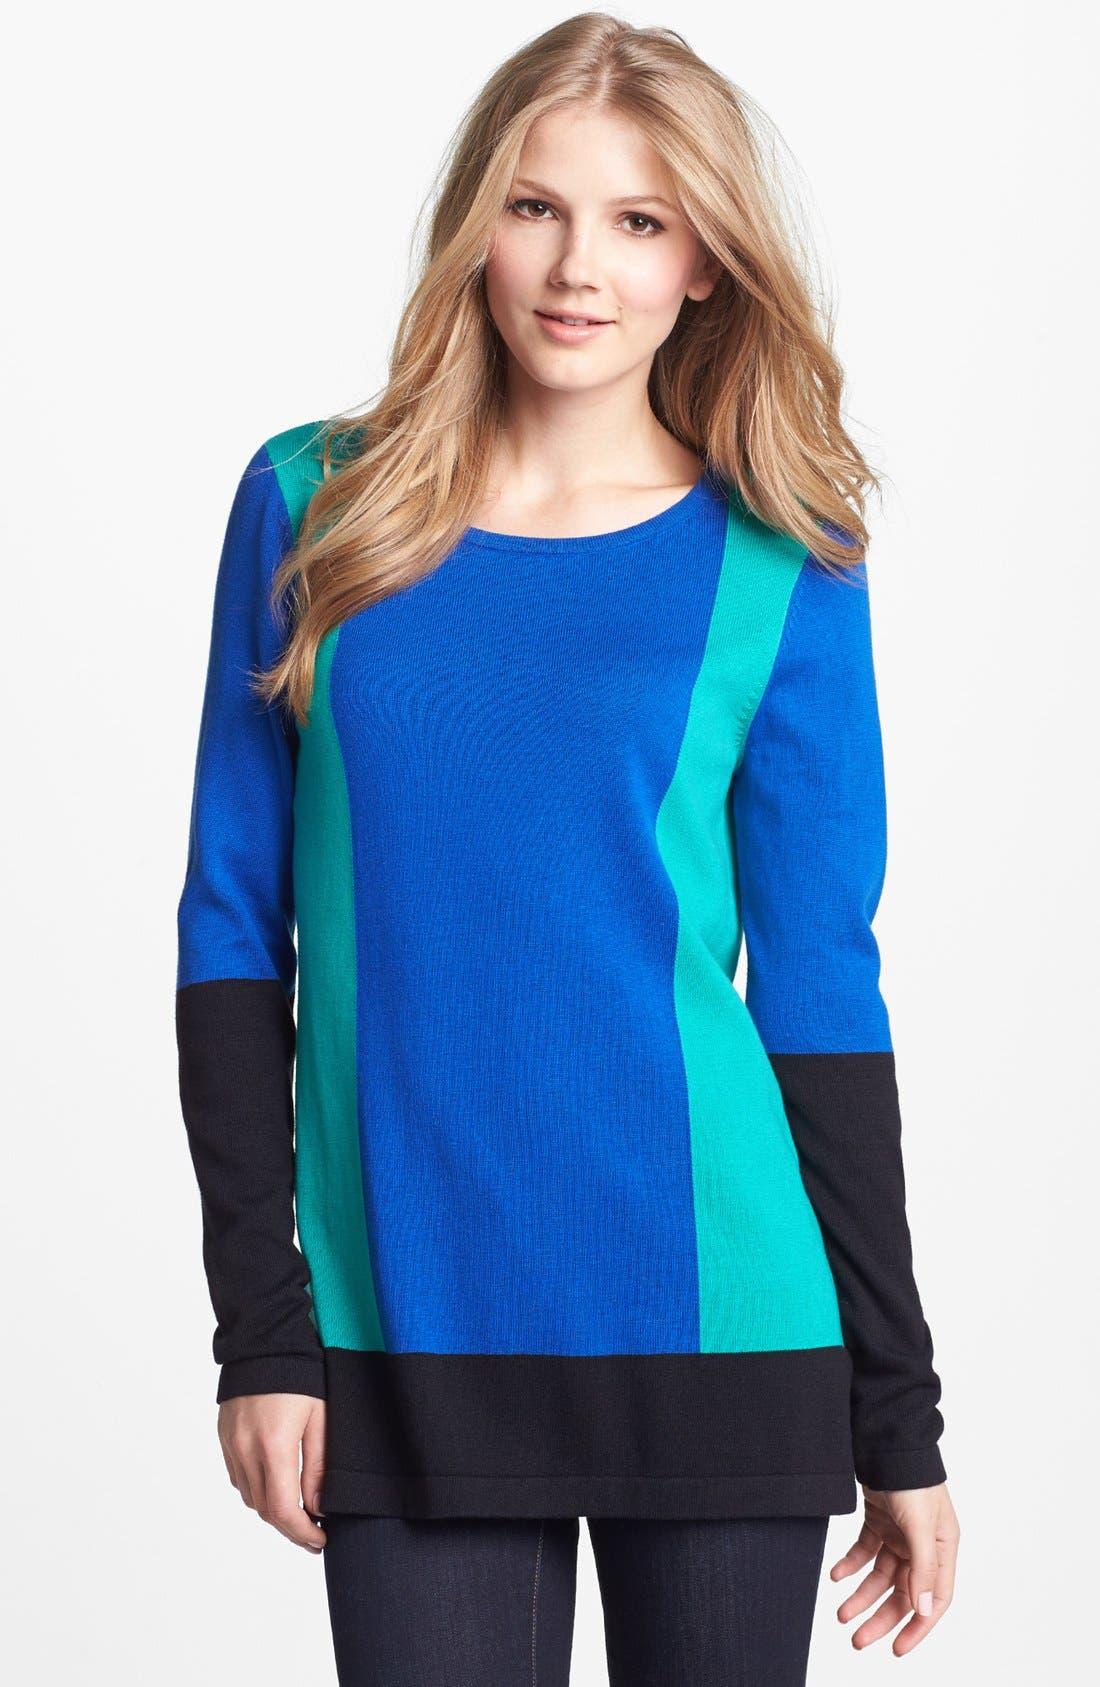 Main Image - Vince Camuto Colorblock Cotton Blend Sweater (Petite)